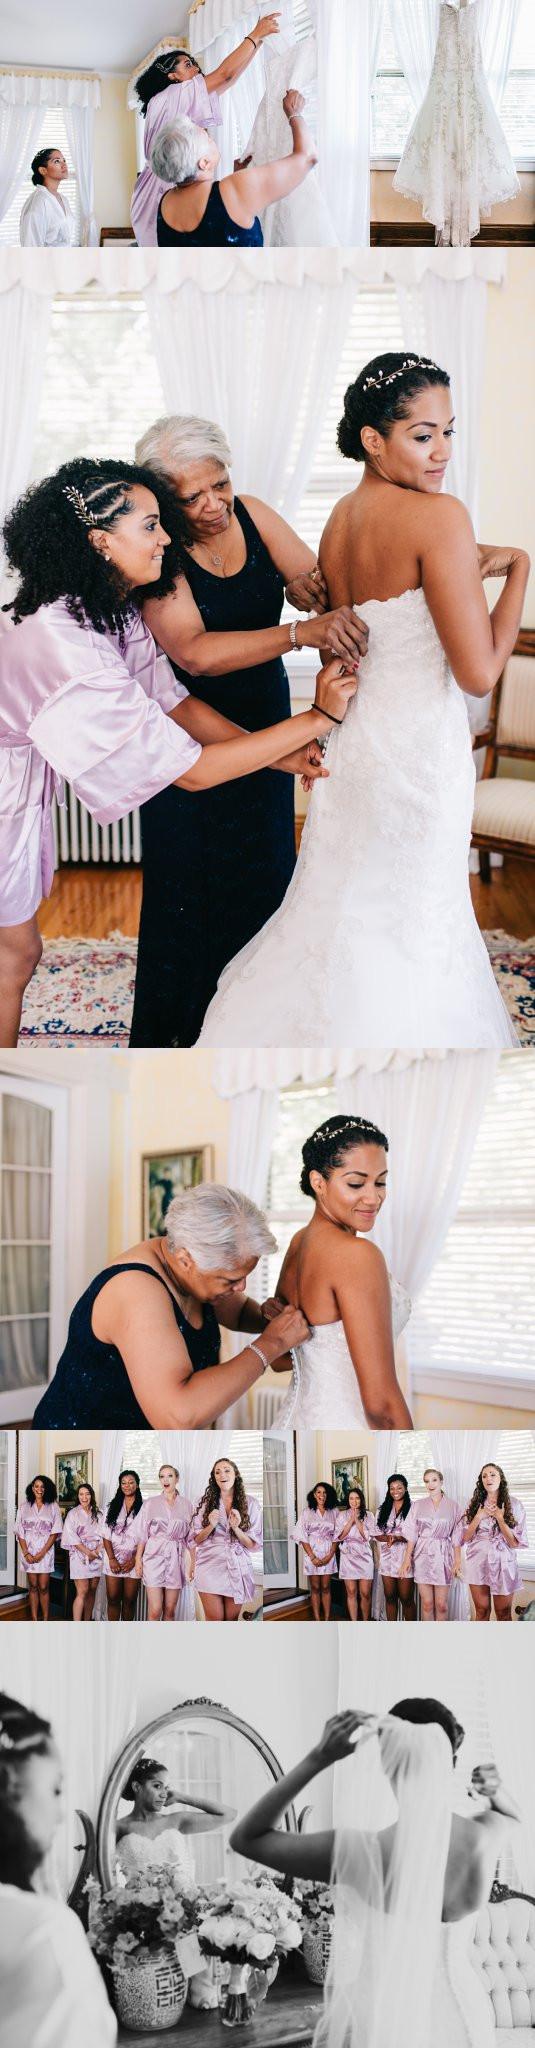 Bride getting ready at Gramercy Mansion Maryland Wedding Photography